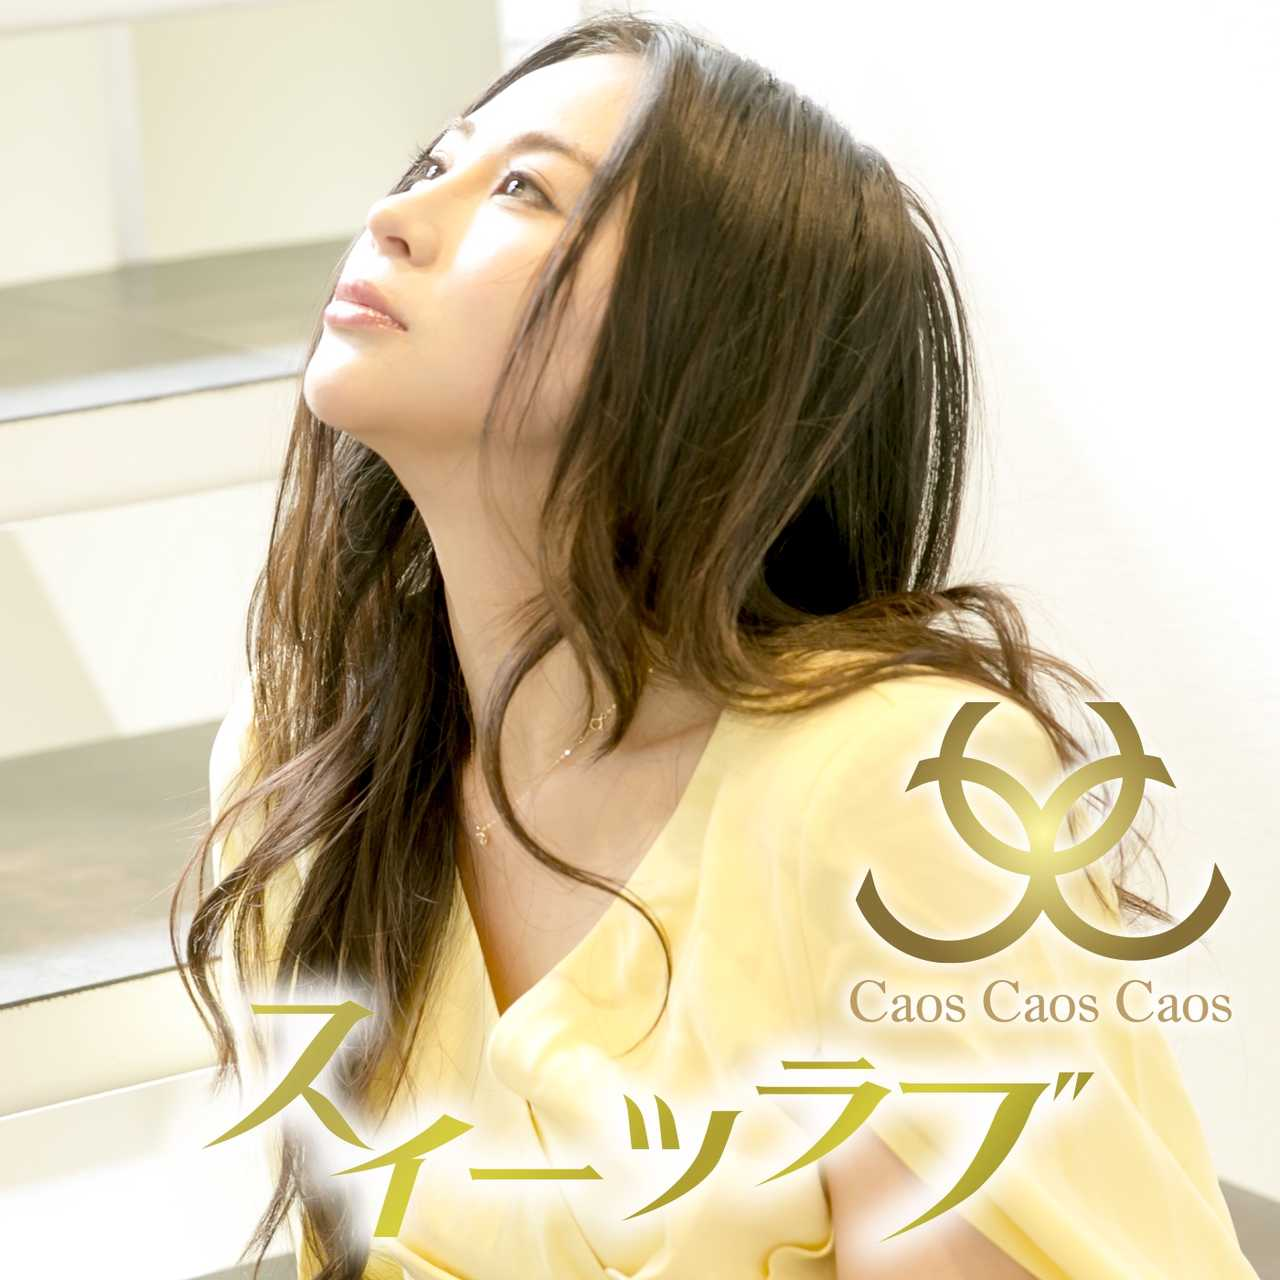 Caos Caos Caos 新年1月に4週連続配信シングルのリリース決定!!